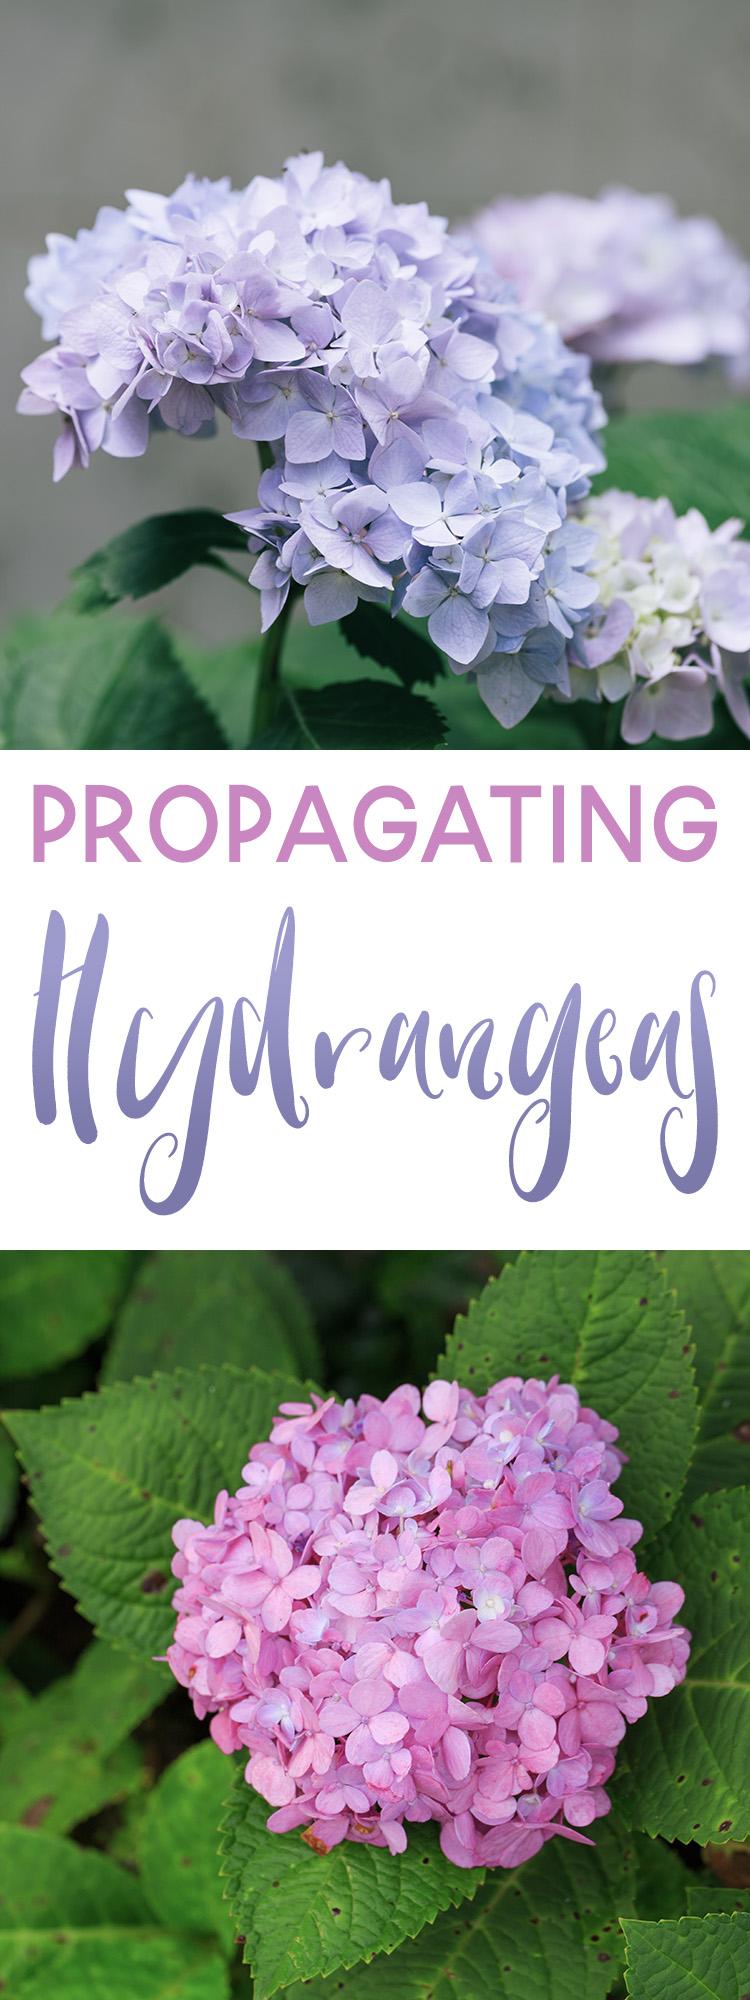 Propagating Hydrangeas 101 - Simple Tips for Propagating Hydrangeas